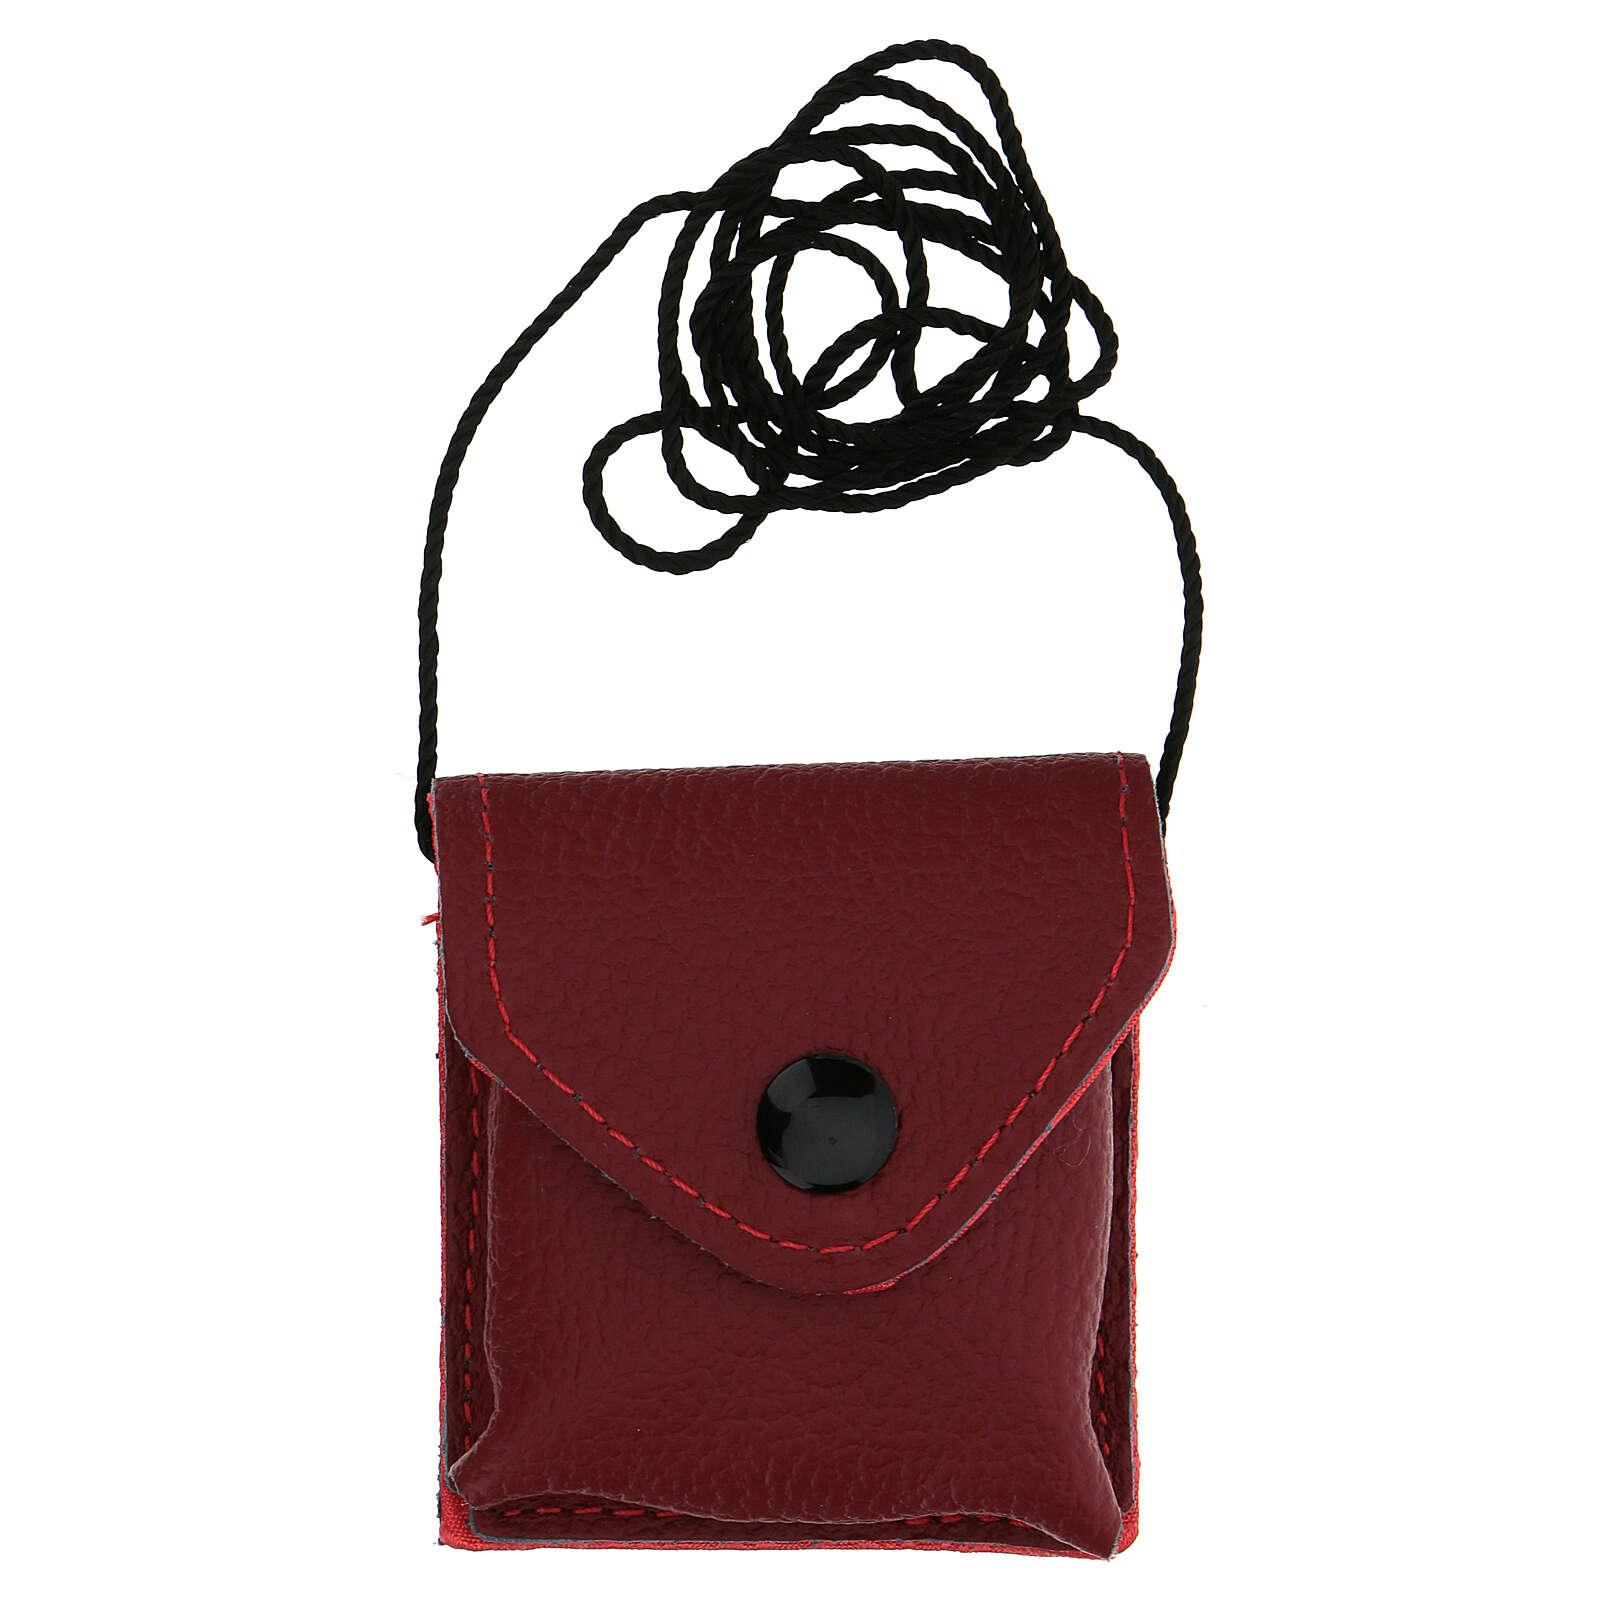 Bolso para viático cuero rojo relicario latón dorado 24k IHS 3